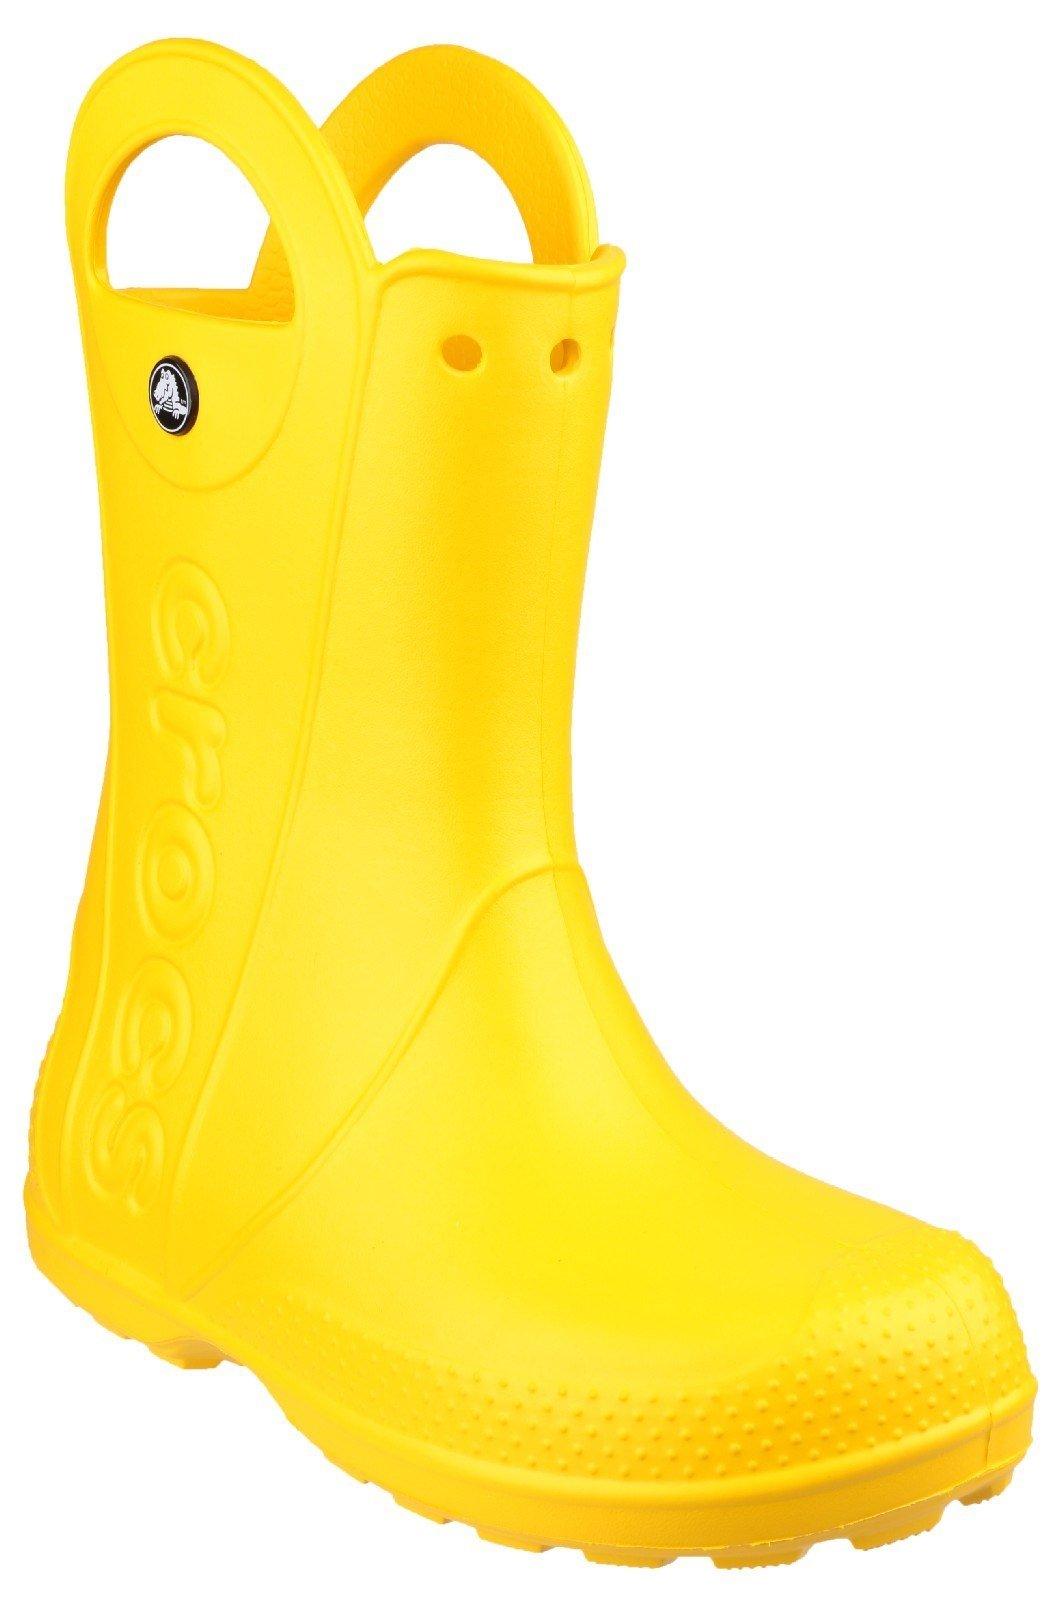 Crocs Kid's Rain Boot Various Colours 21080 - Yellow 6 UK